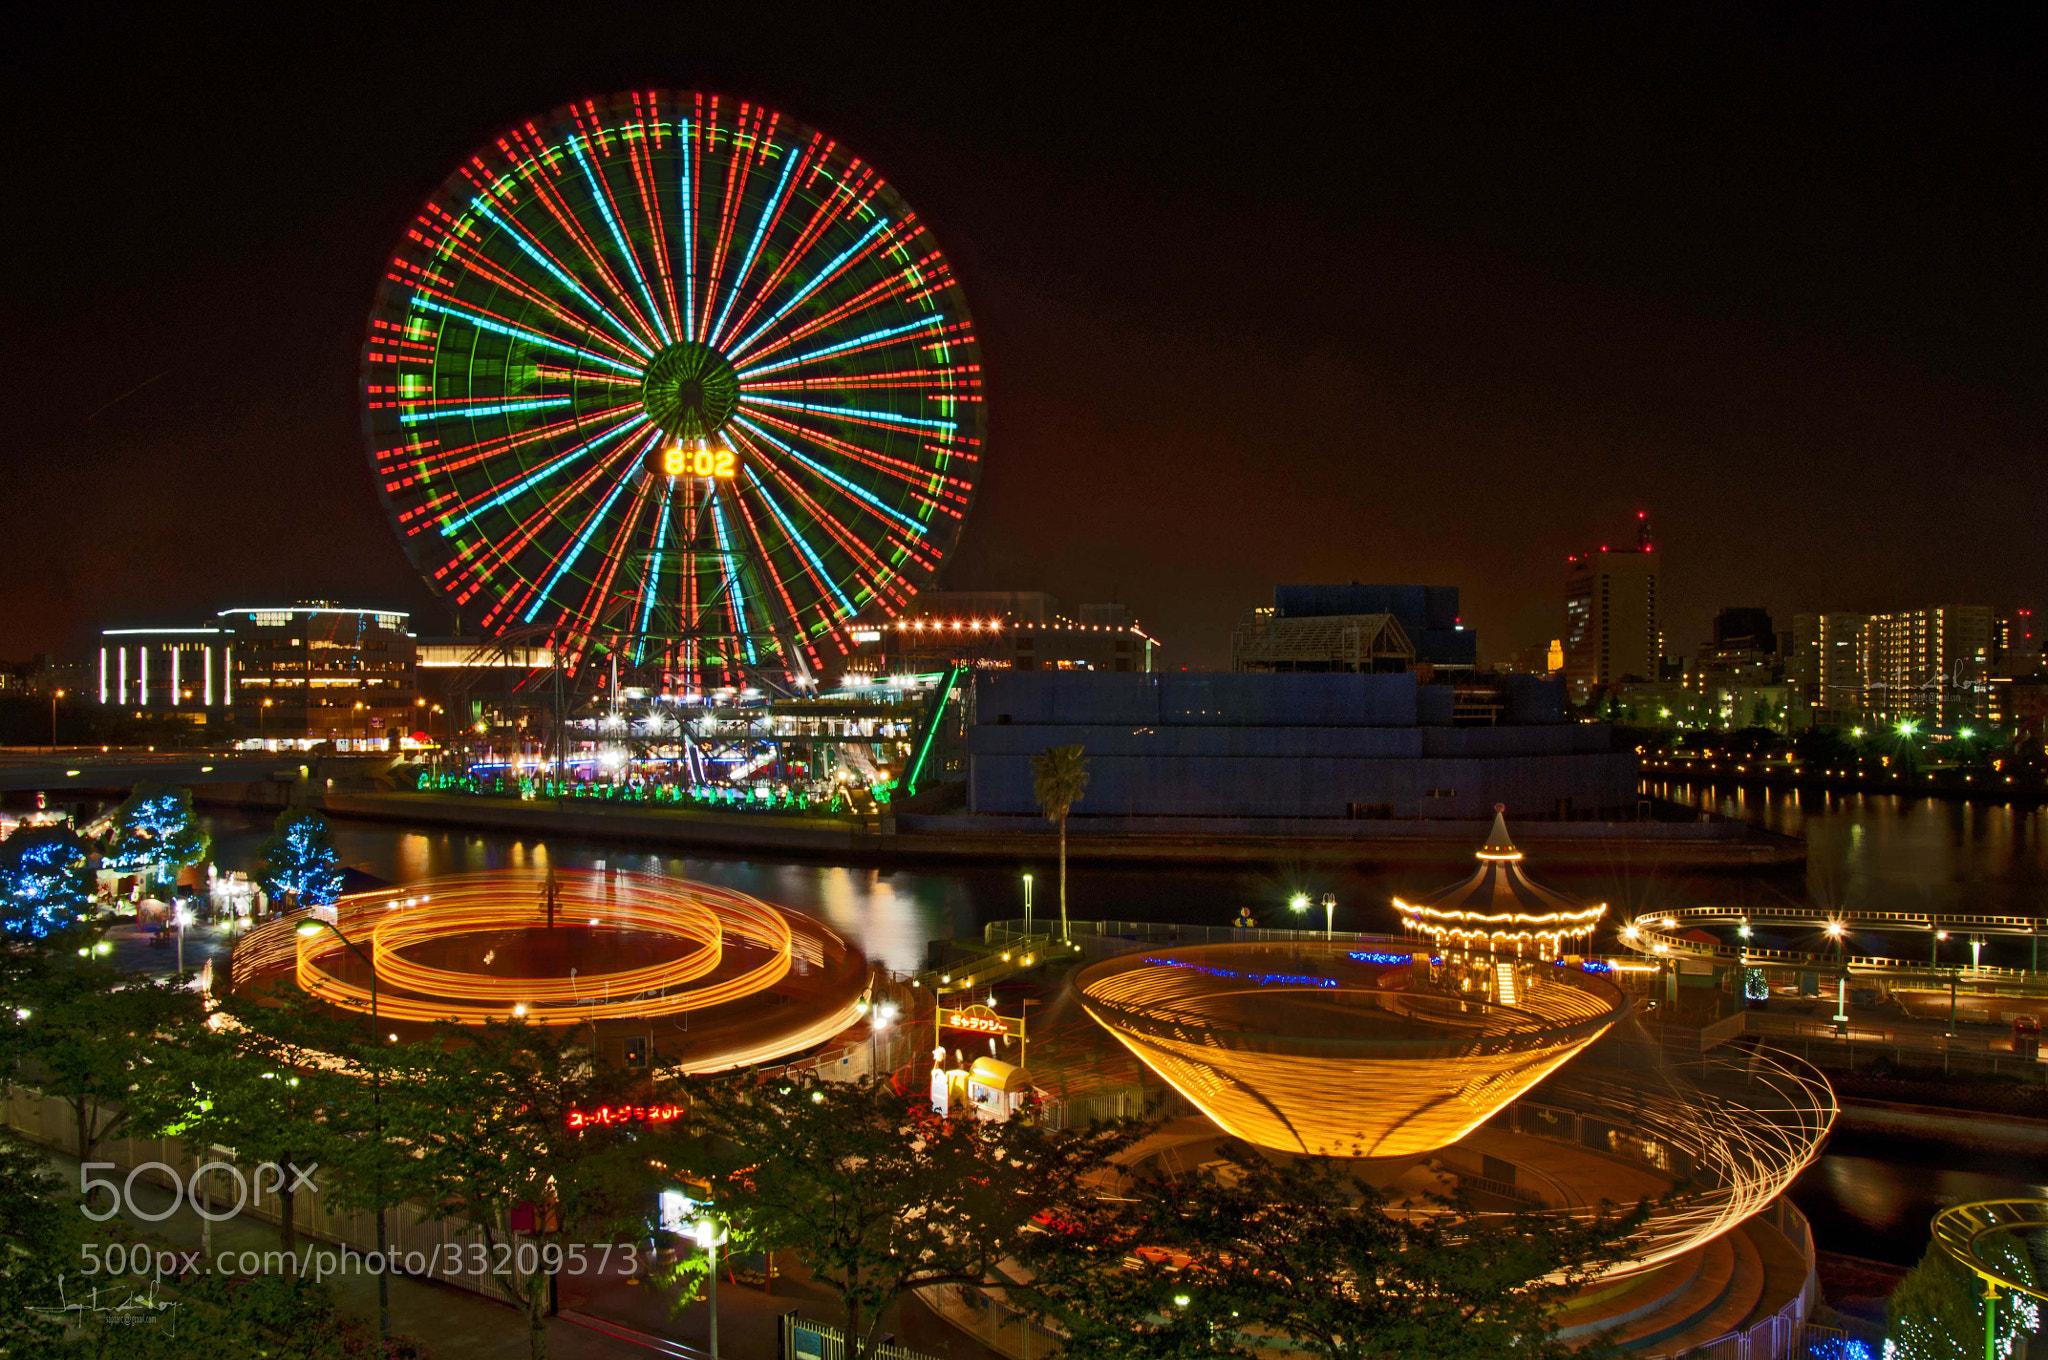 Photograph Yokohama giant wheel by Saptarshi Roy on 500px